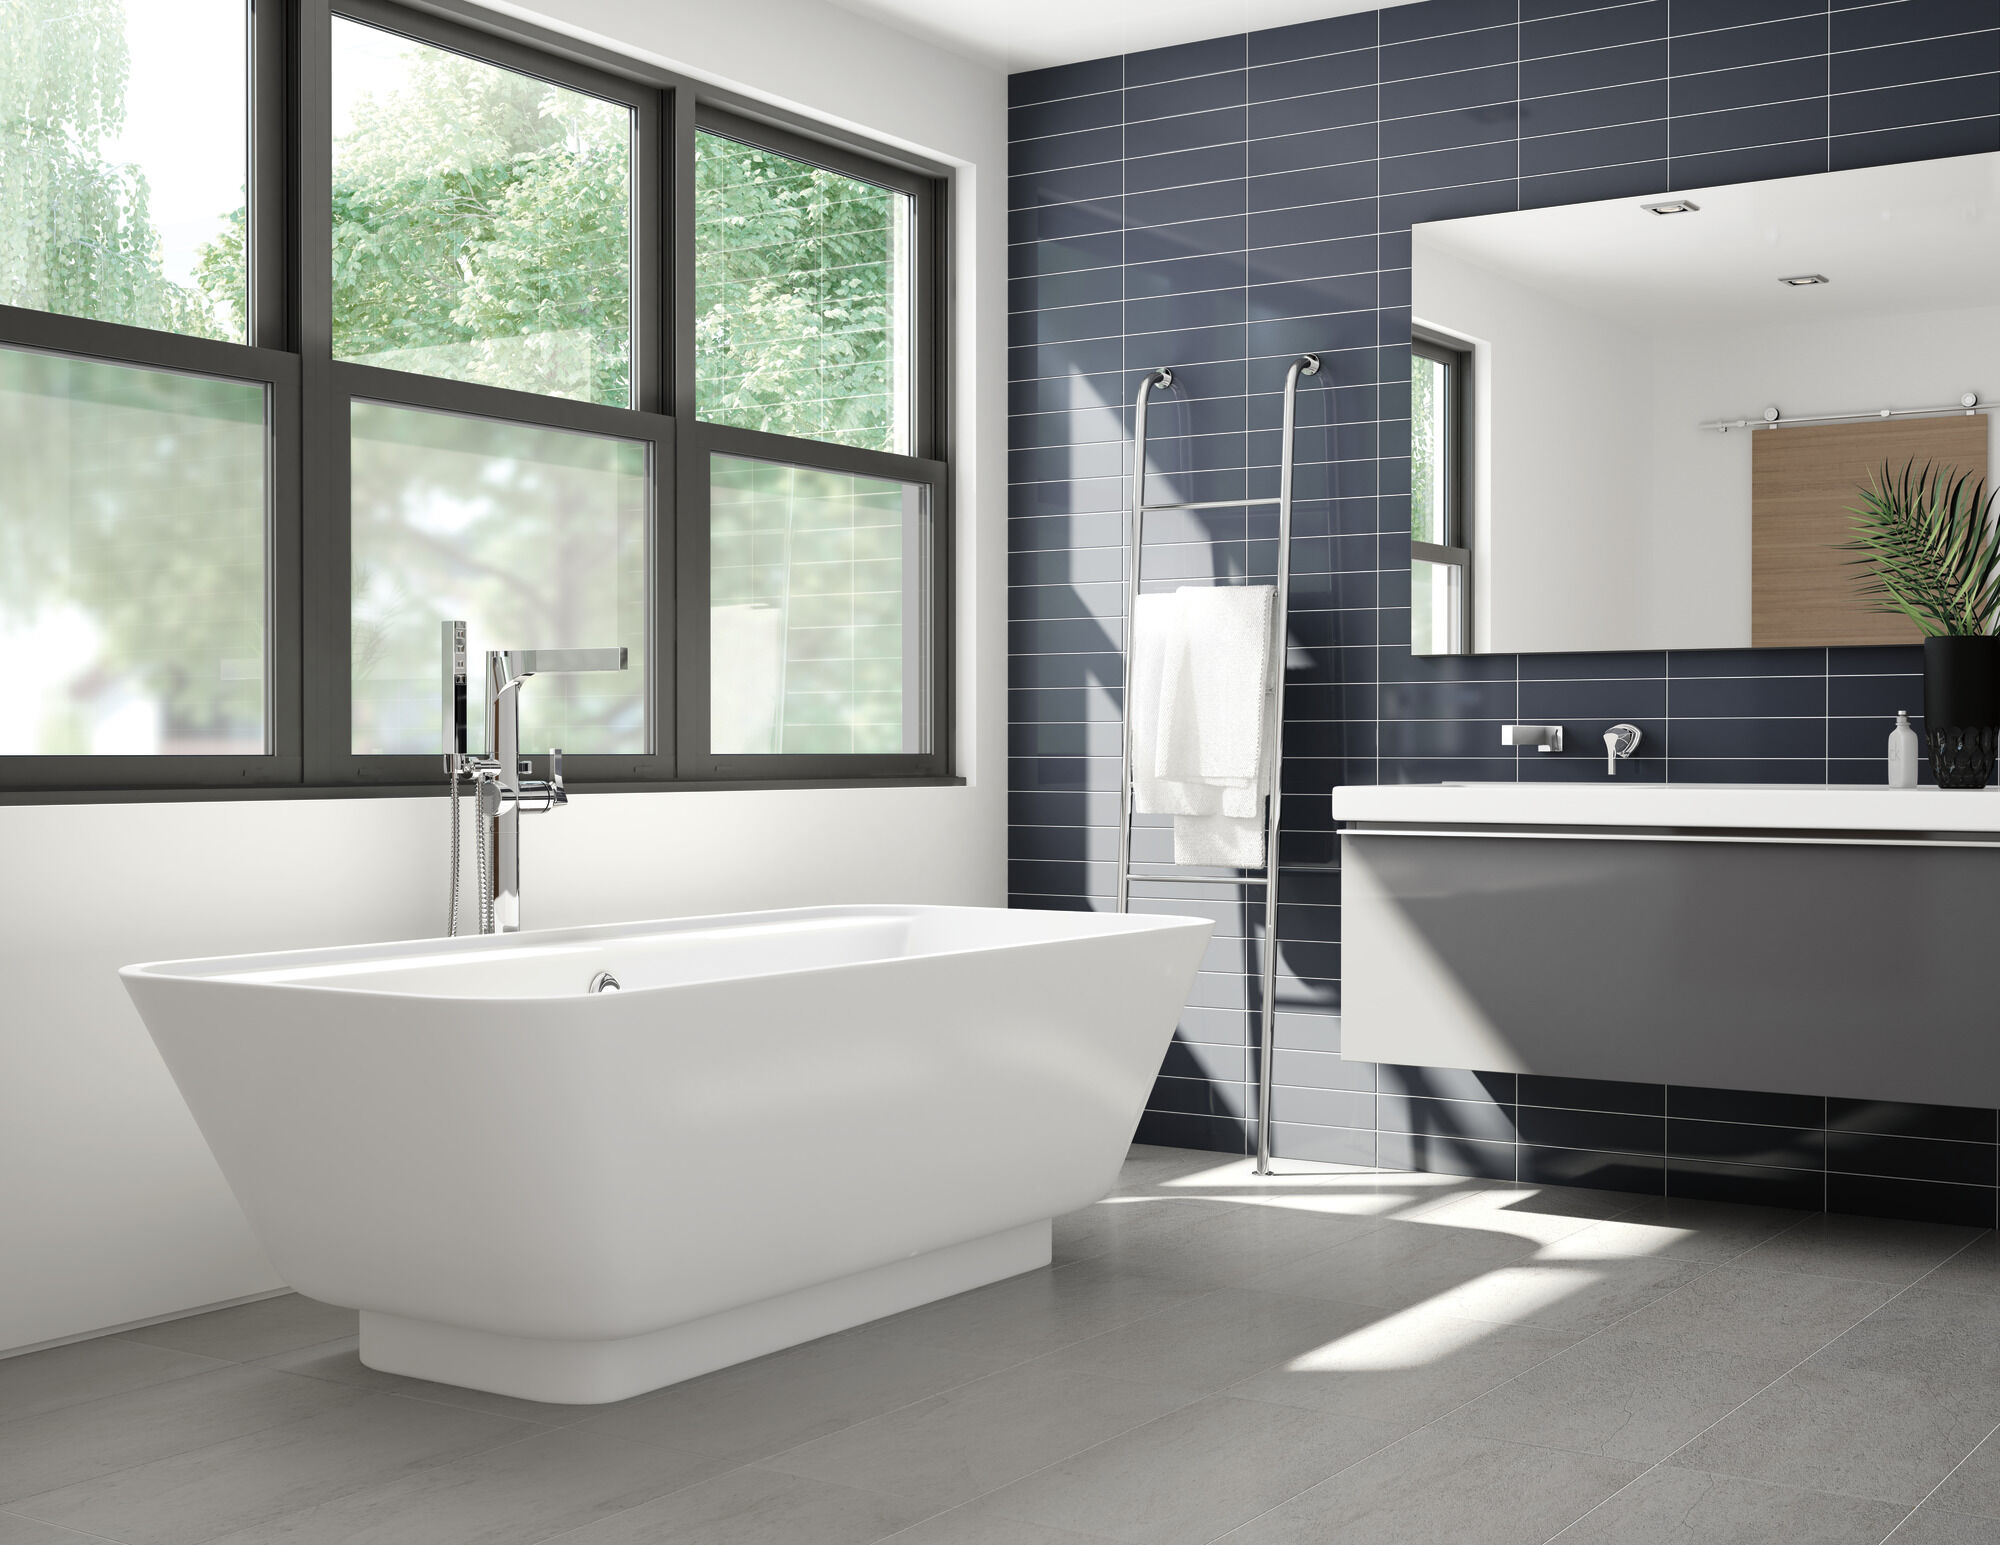 single handle floor mount tub filler trim with hand shower